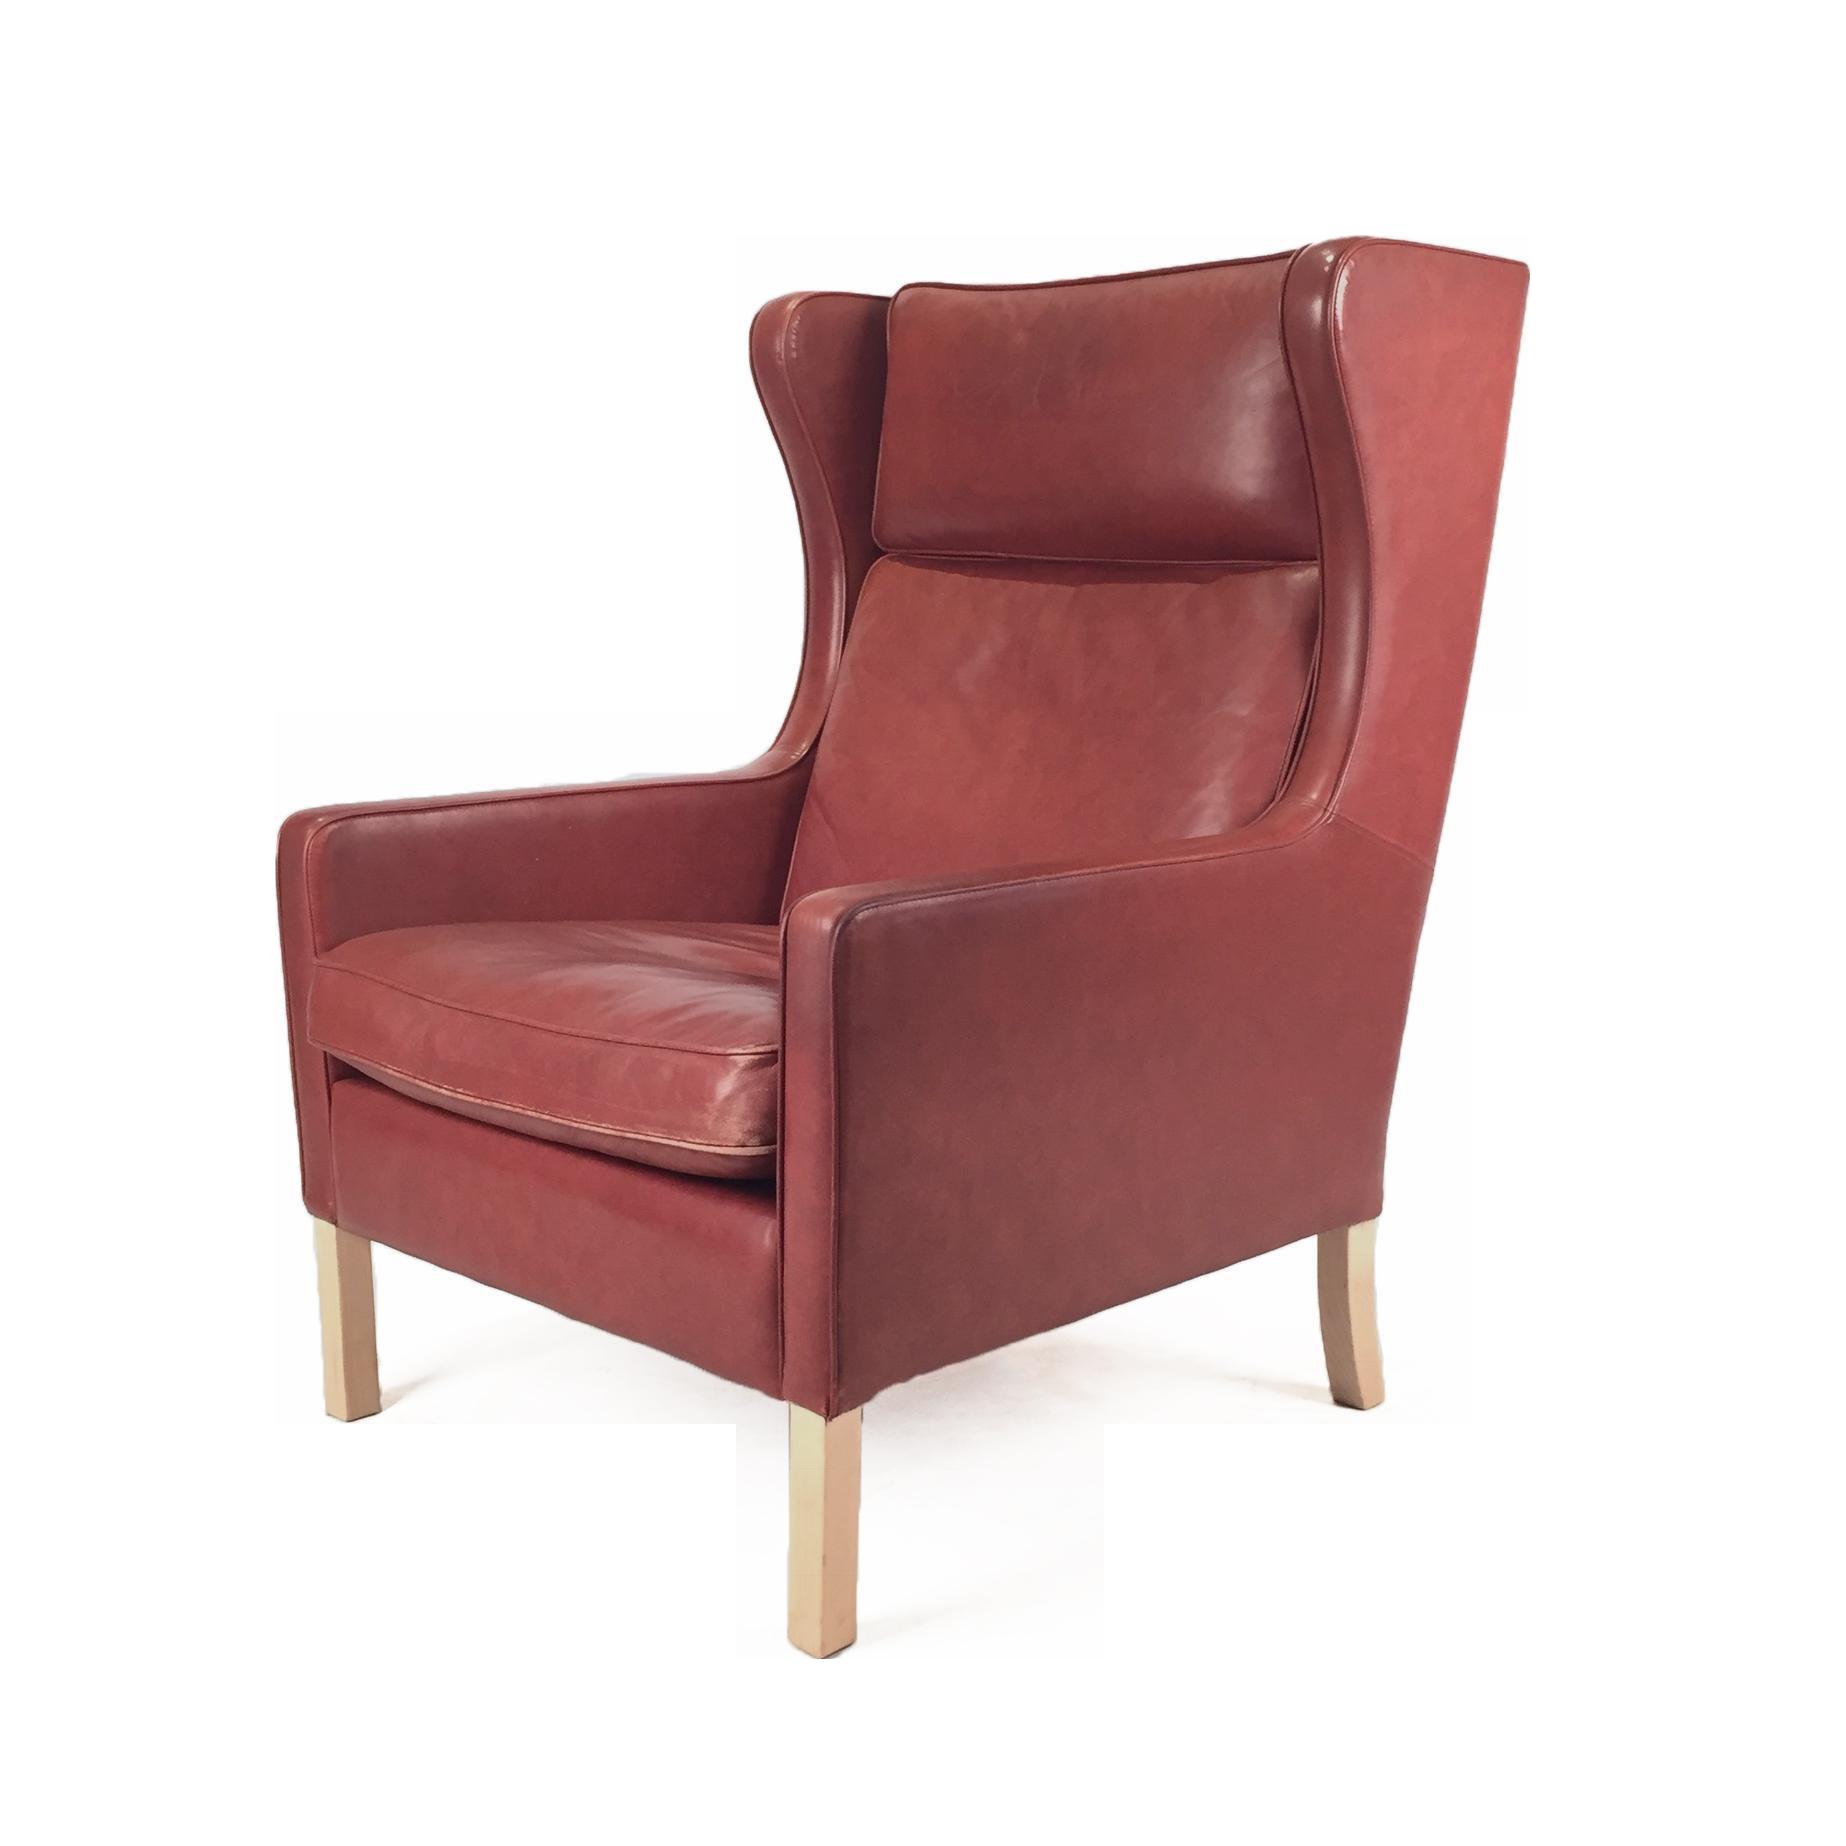 1960s Danish Modern Mogensen Highback Brick Red Leather Lounger